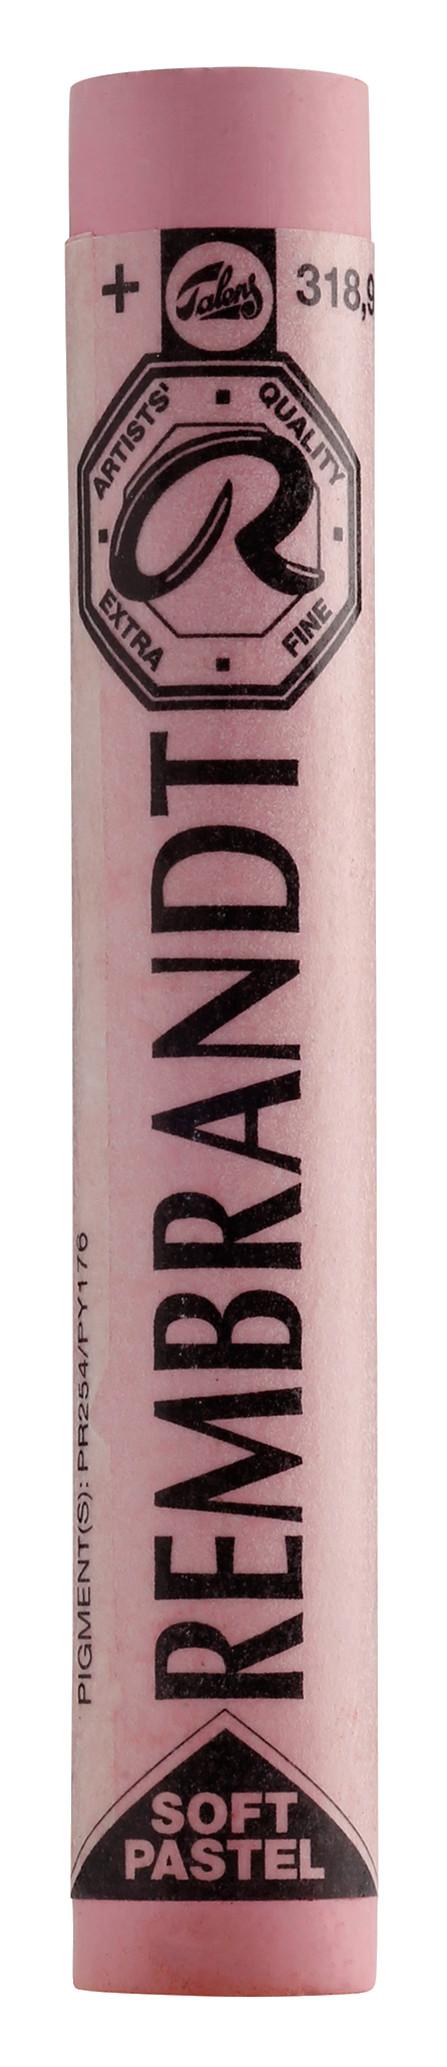 Rembrandt Soft Pastel Round Full Stick Carmine(9) (318.9)